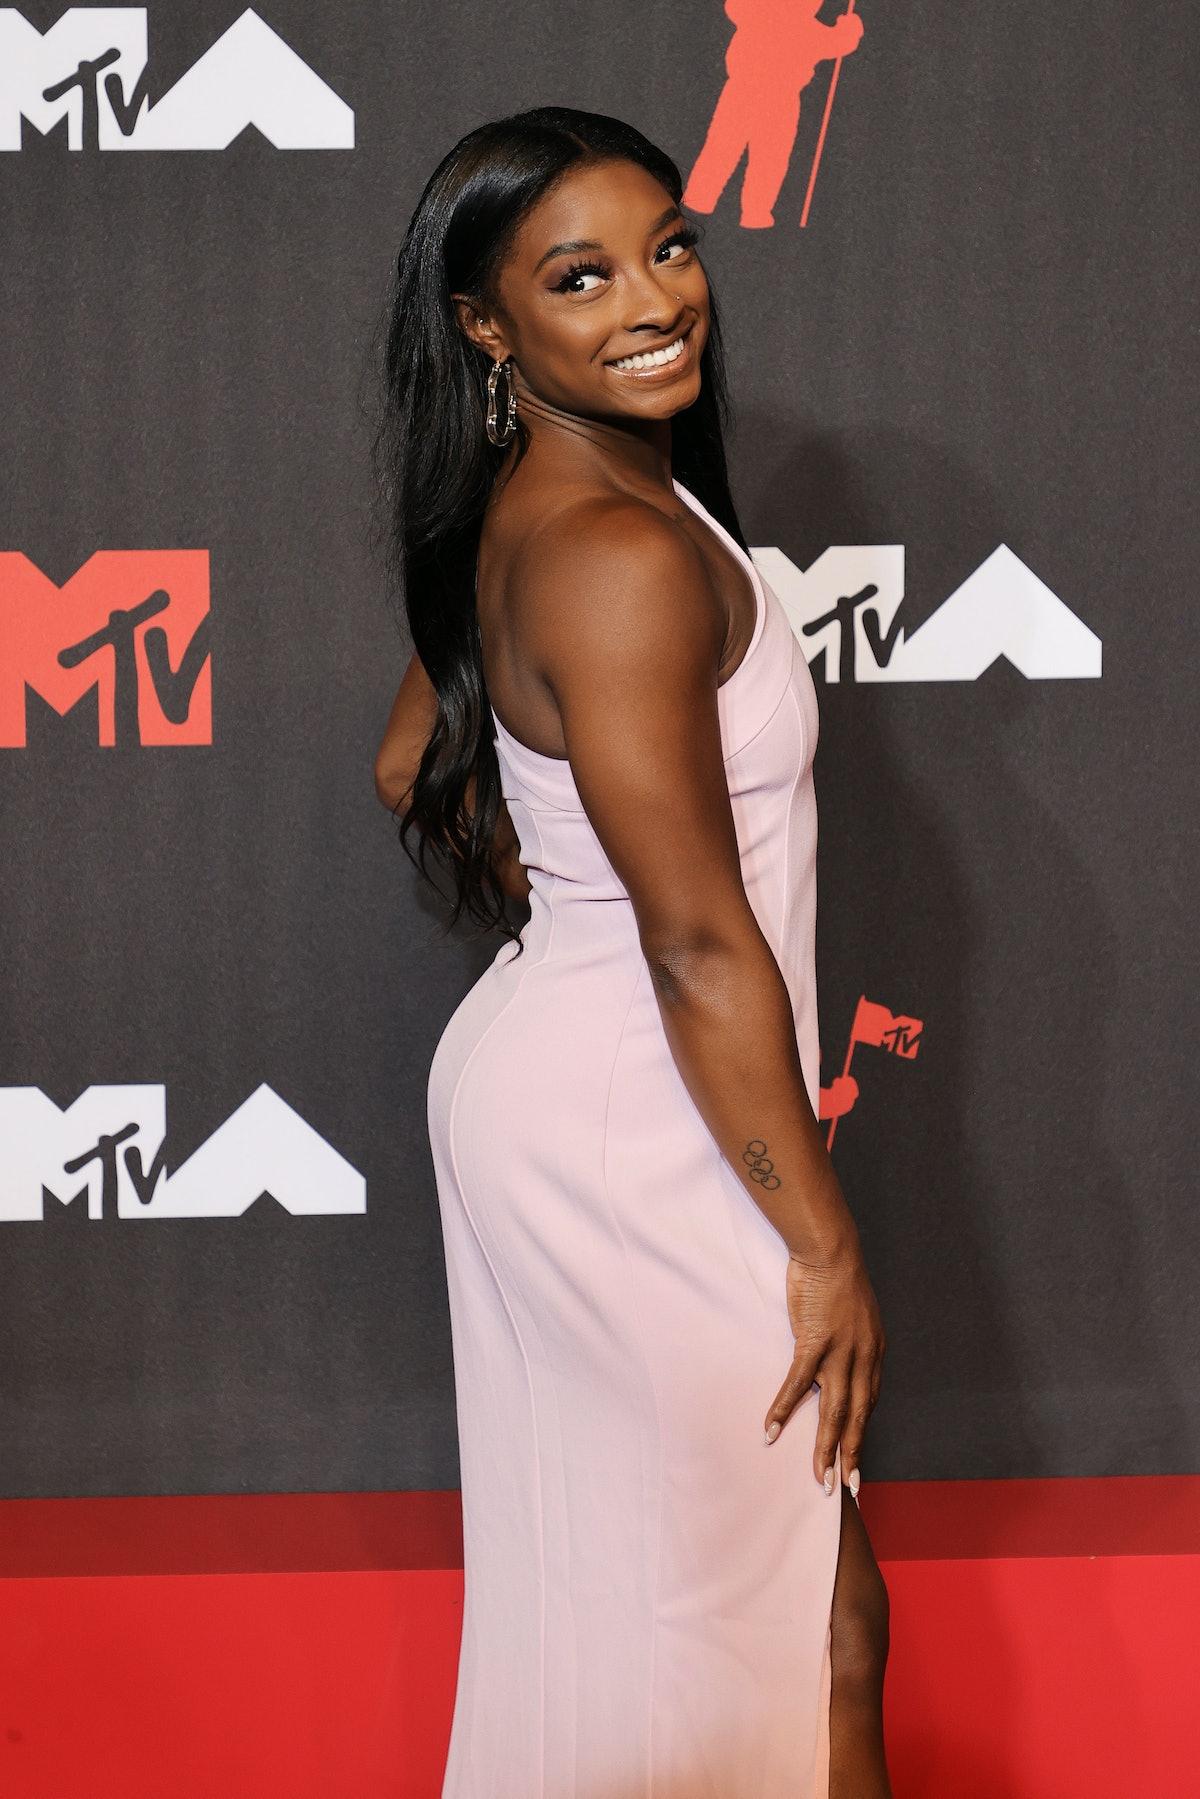 NEW YORK, NEW YORK - SEPTEMBER 12: Simone Biles attends the 2021 MTV Video Music Awards at Barclays ...